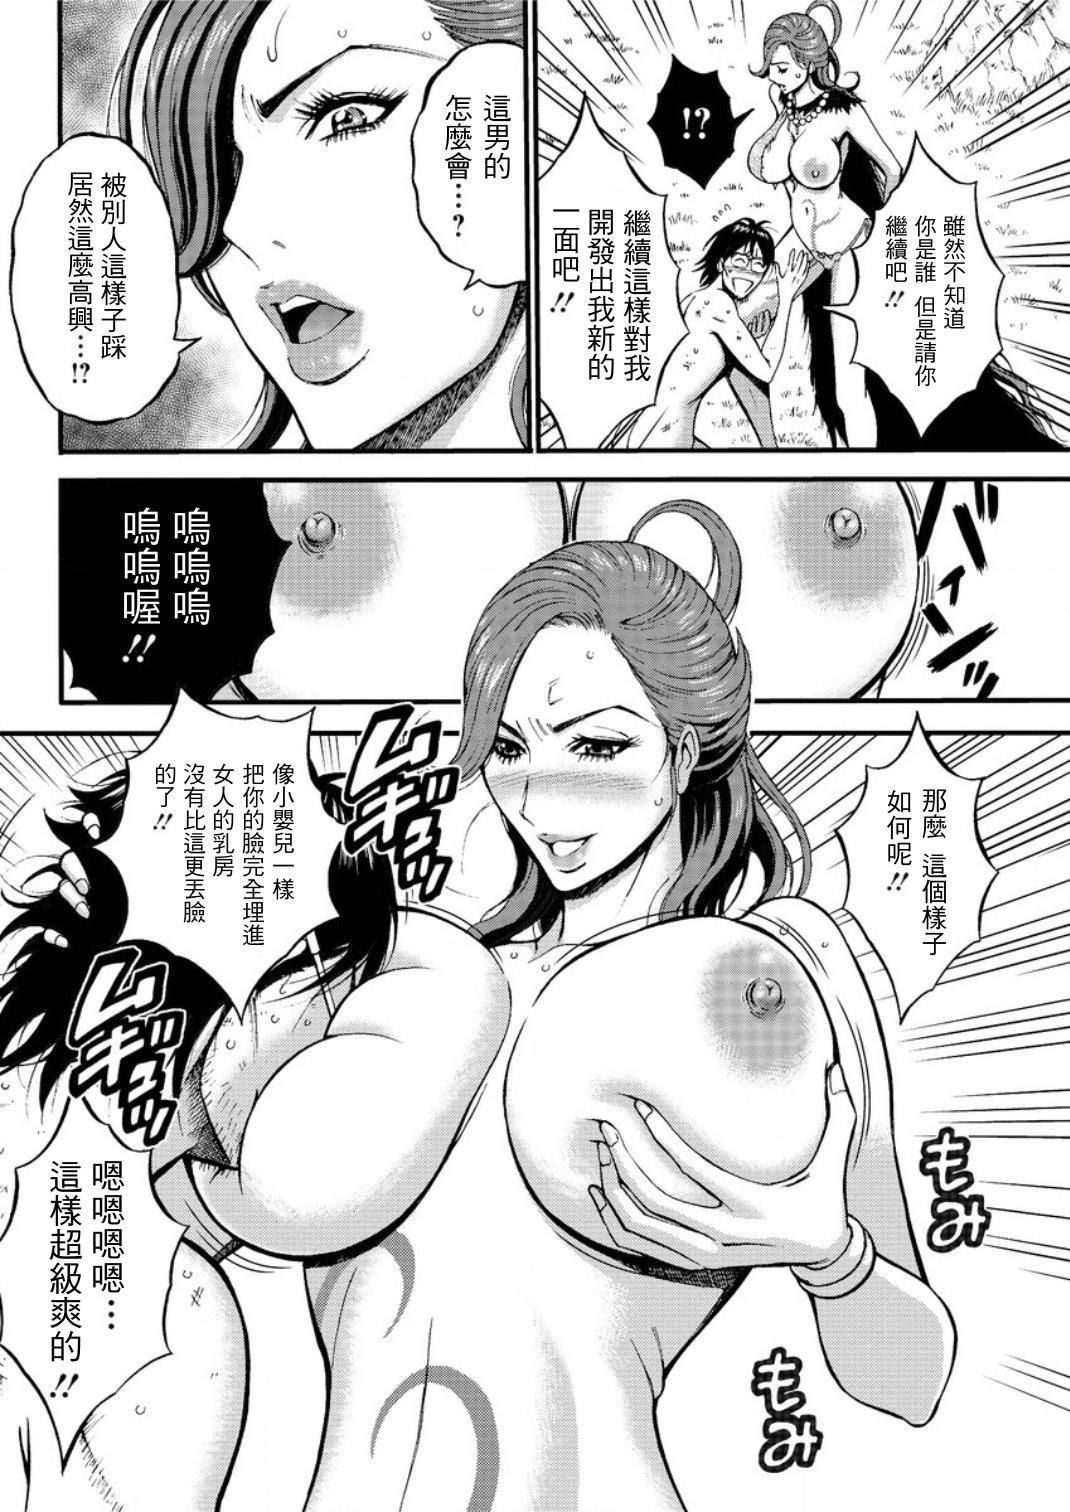 Kigenzen 10000 Nen no Ota | 史前一萬年的宅男 Ch. 19-24 64